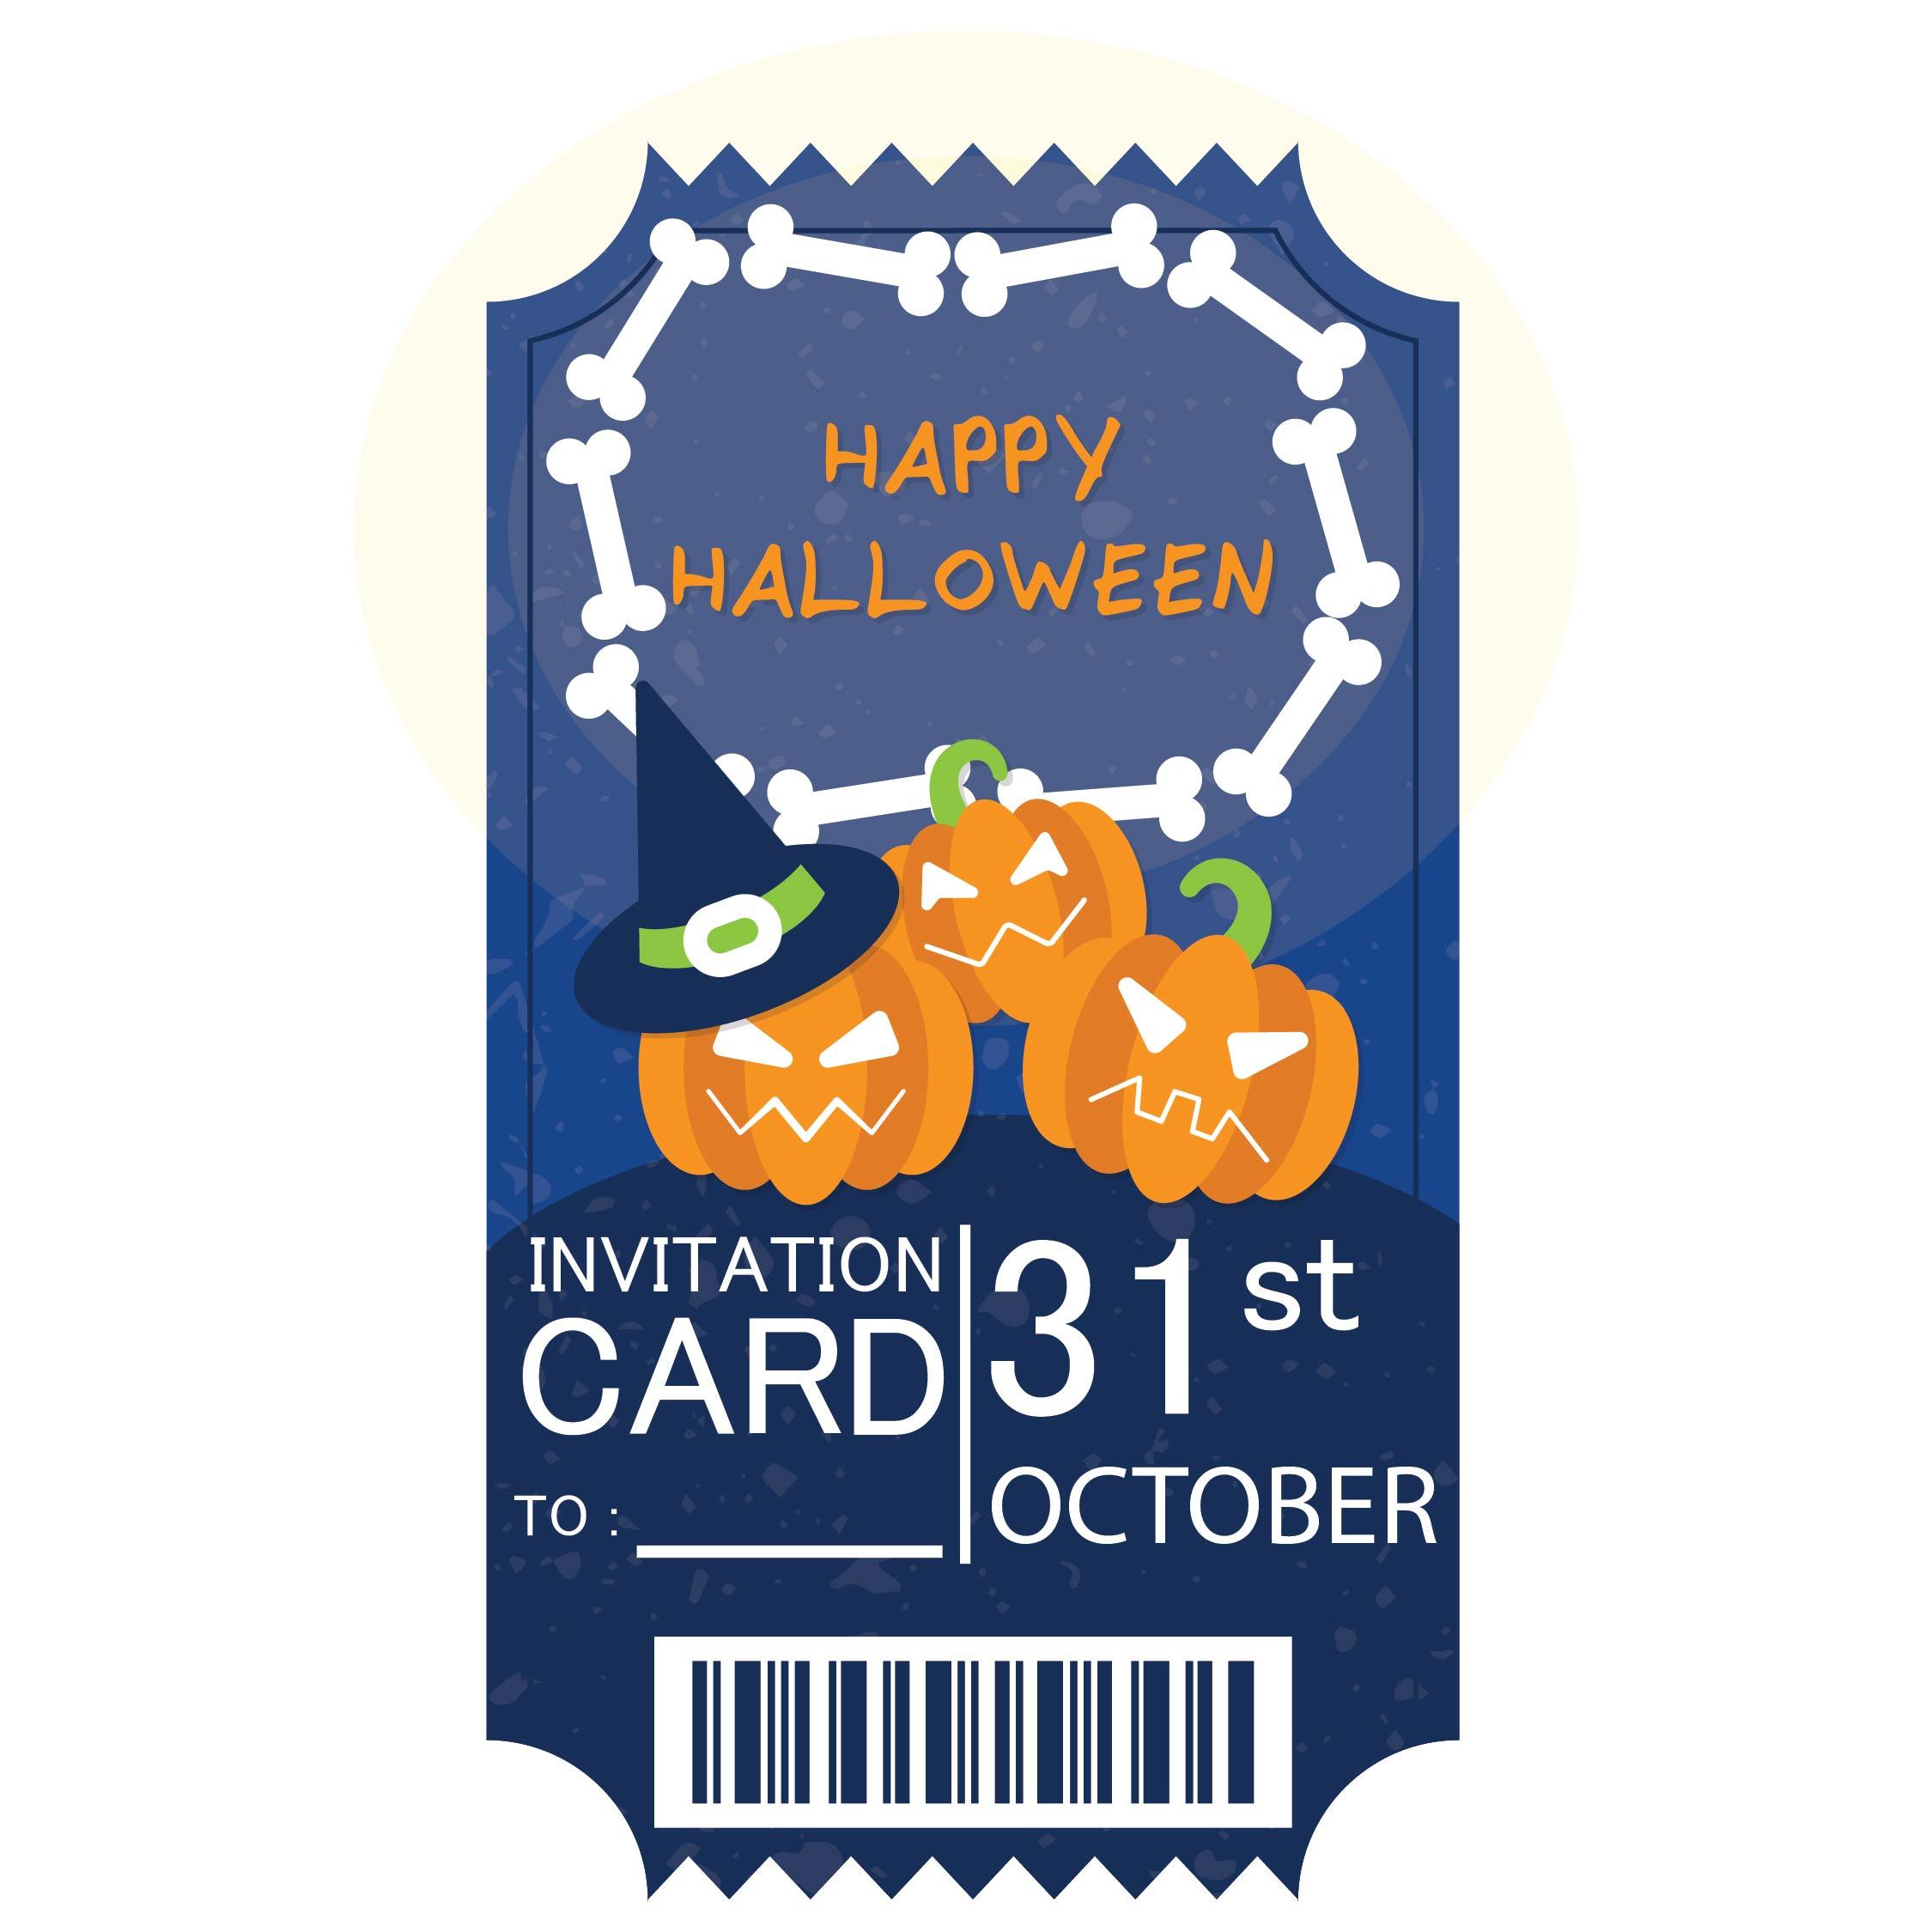 Printable Halloween Invitations Templates